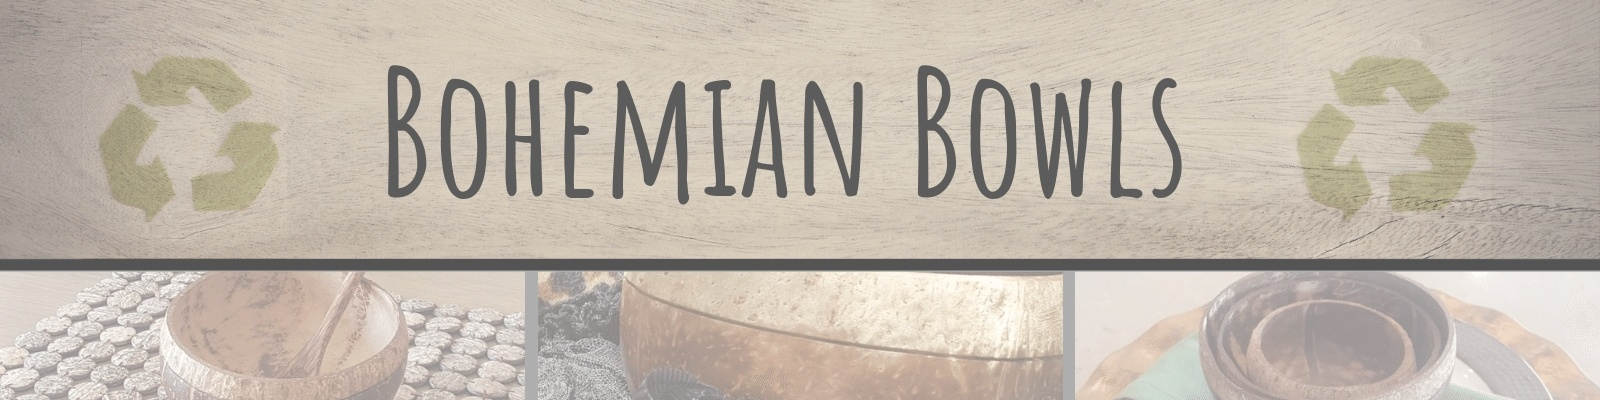 Verte Luxe Eco-Boutiques | Bohemian Bowls Storefront